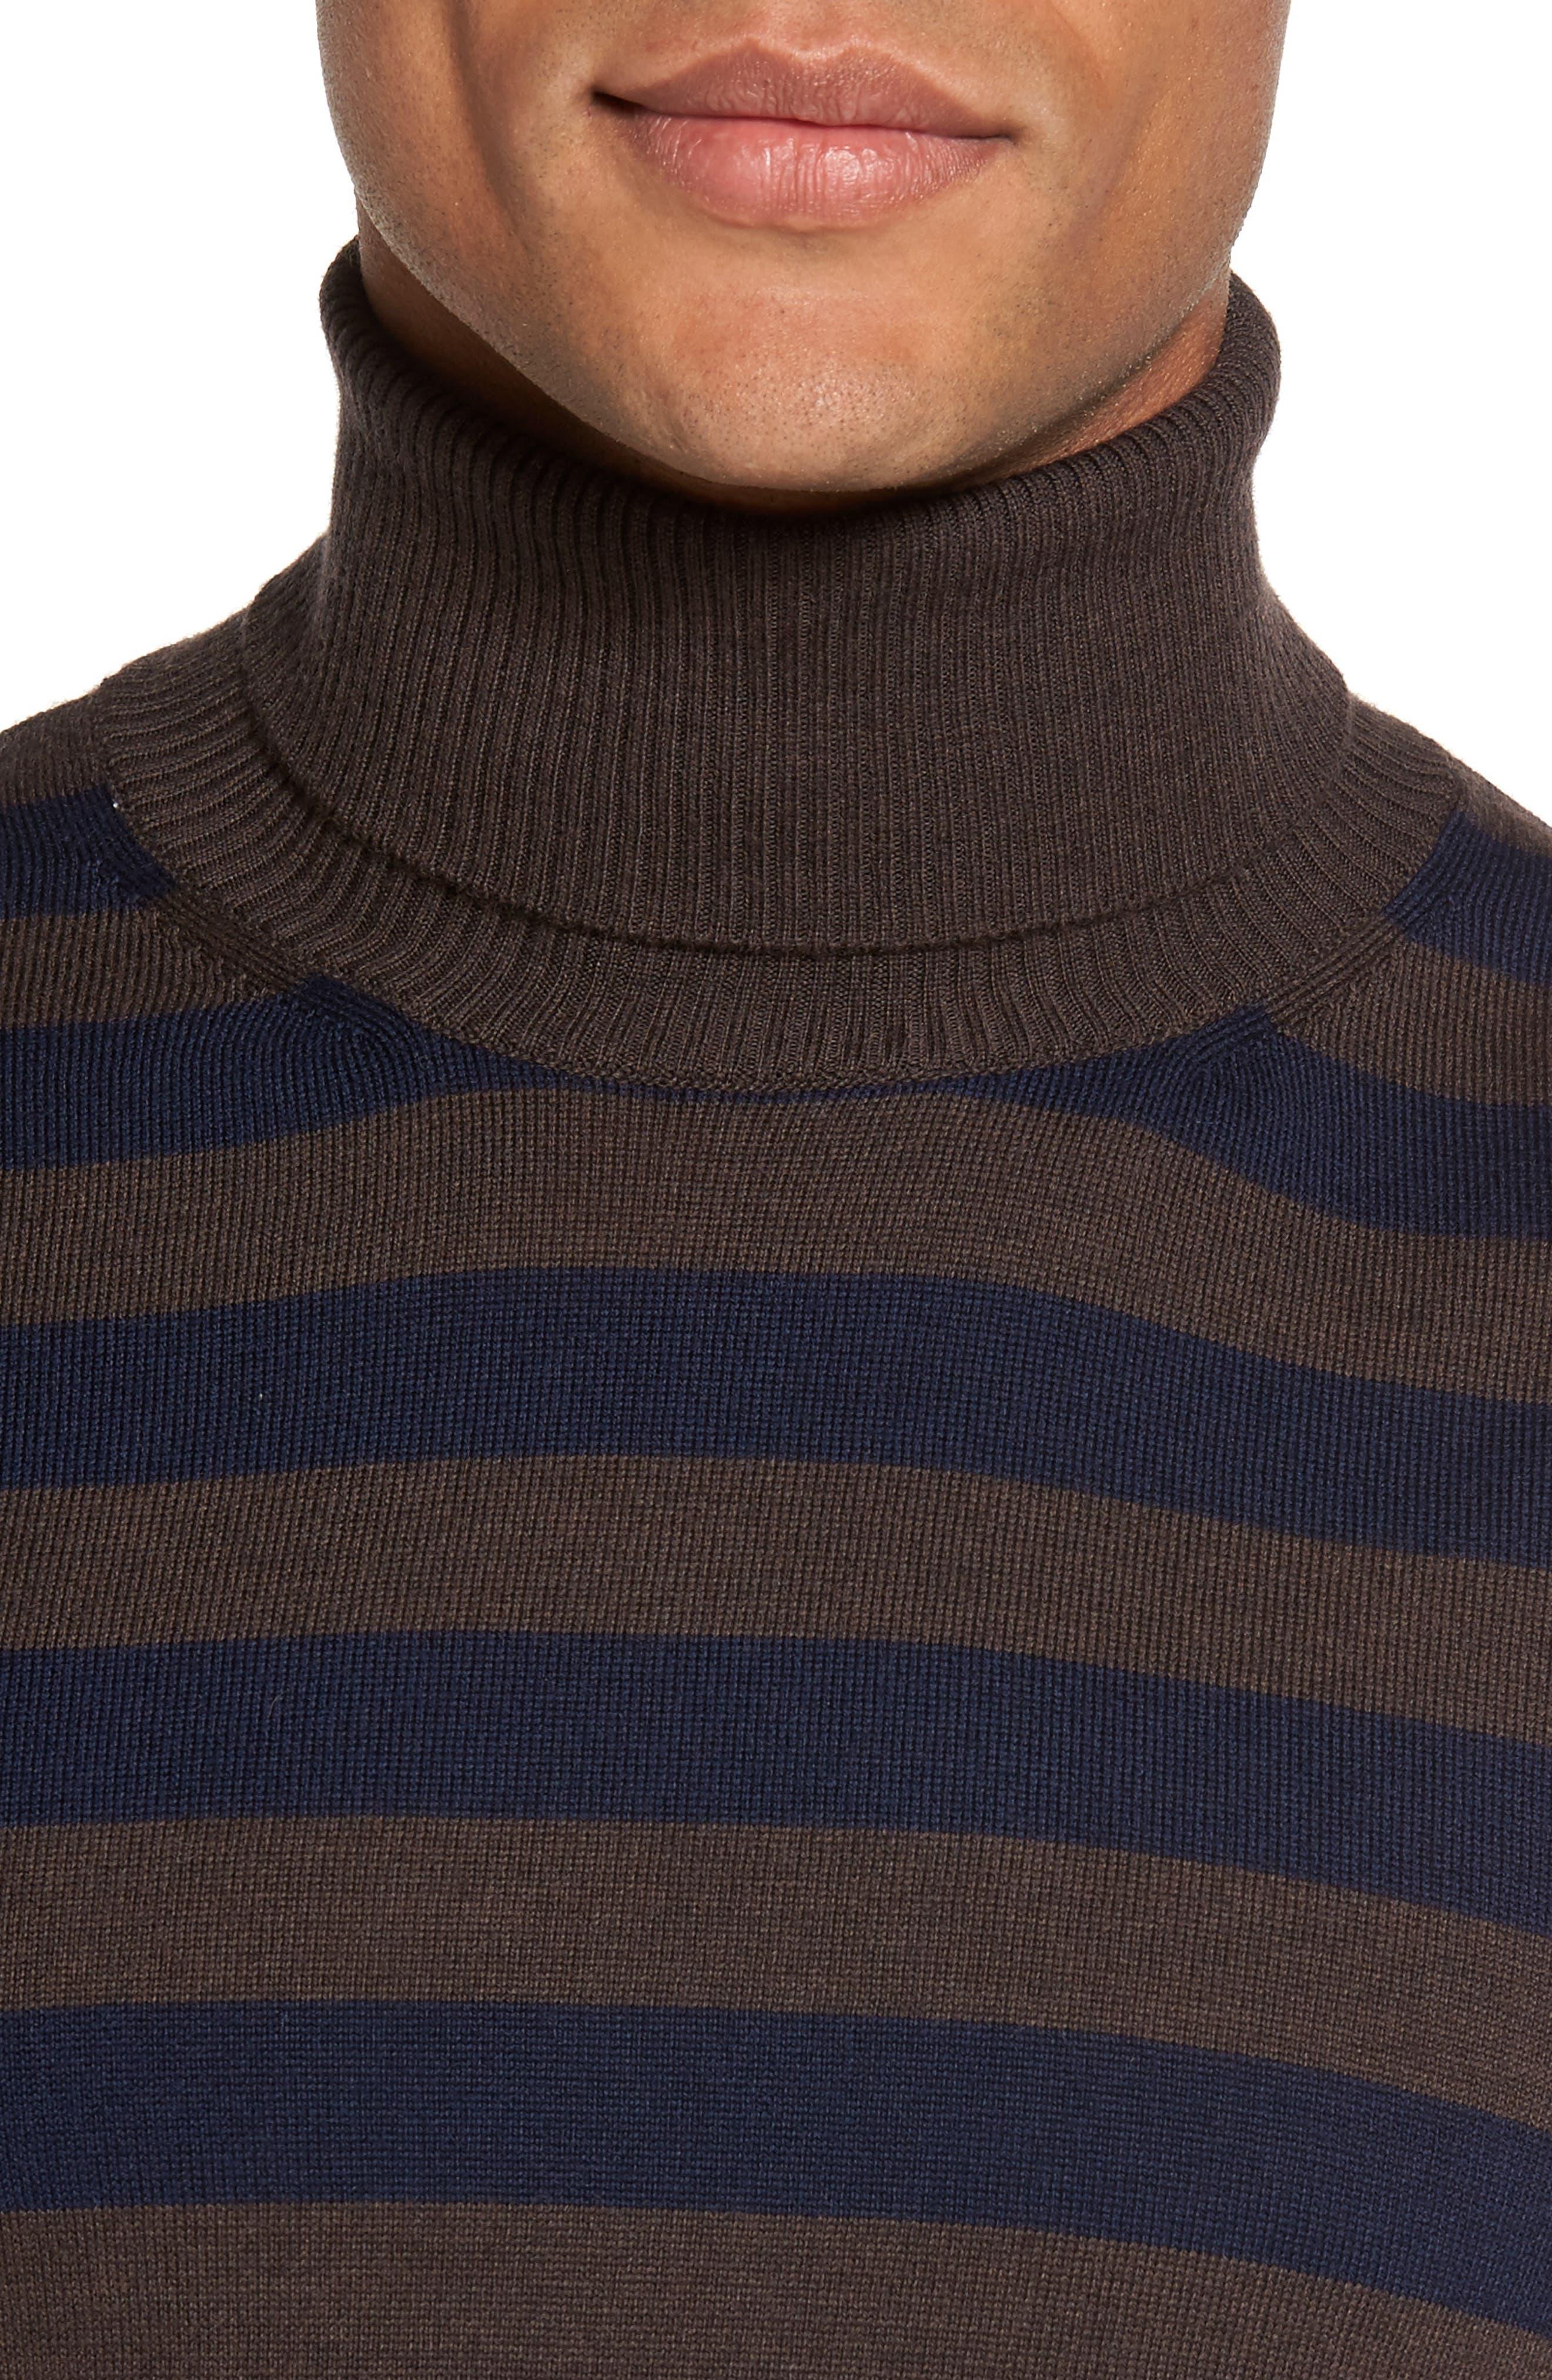 Striped Turtleneck Sweater,                             Alternate thumbnail 4, color,                             204